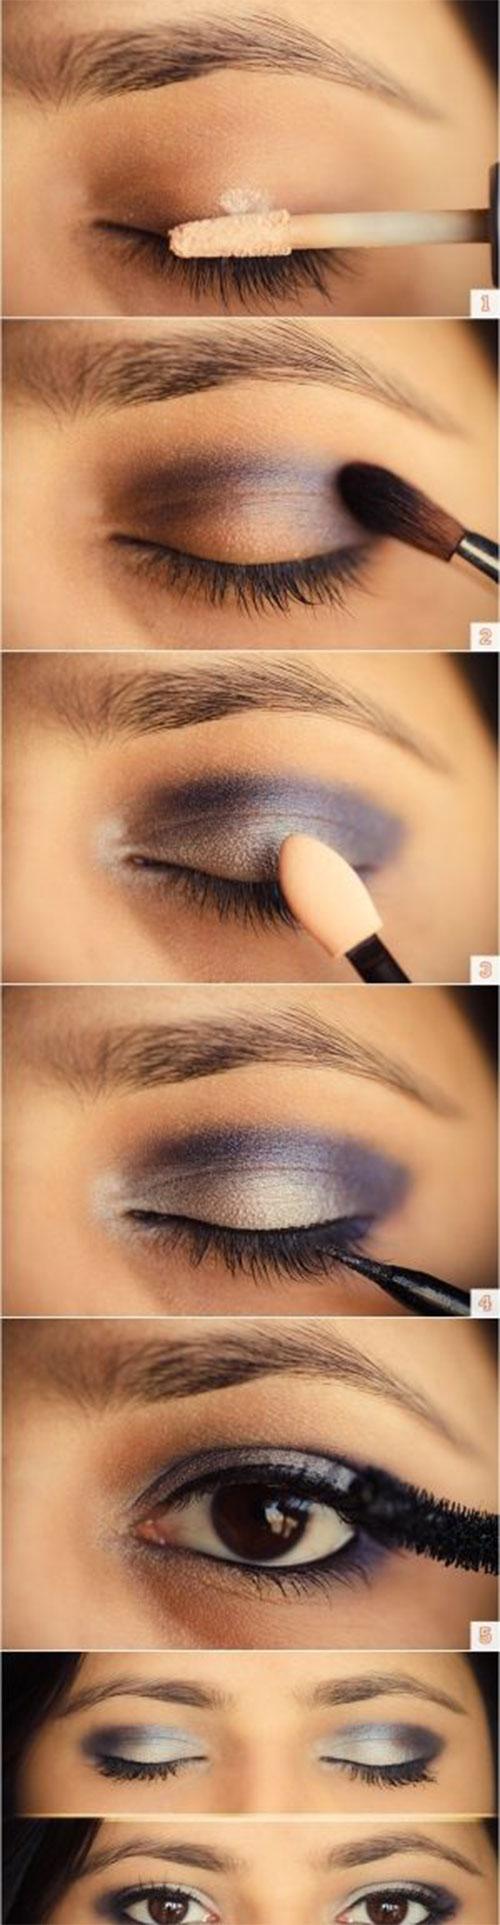 20-Happy-New-Year-Eve-Eye-Makeup-Tutorial-2015-11